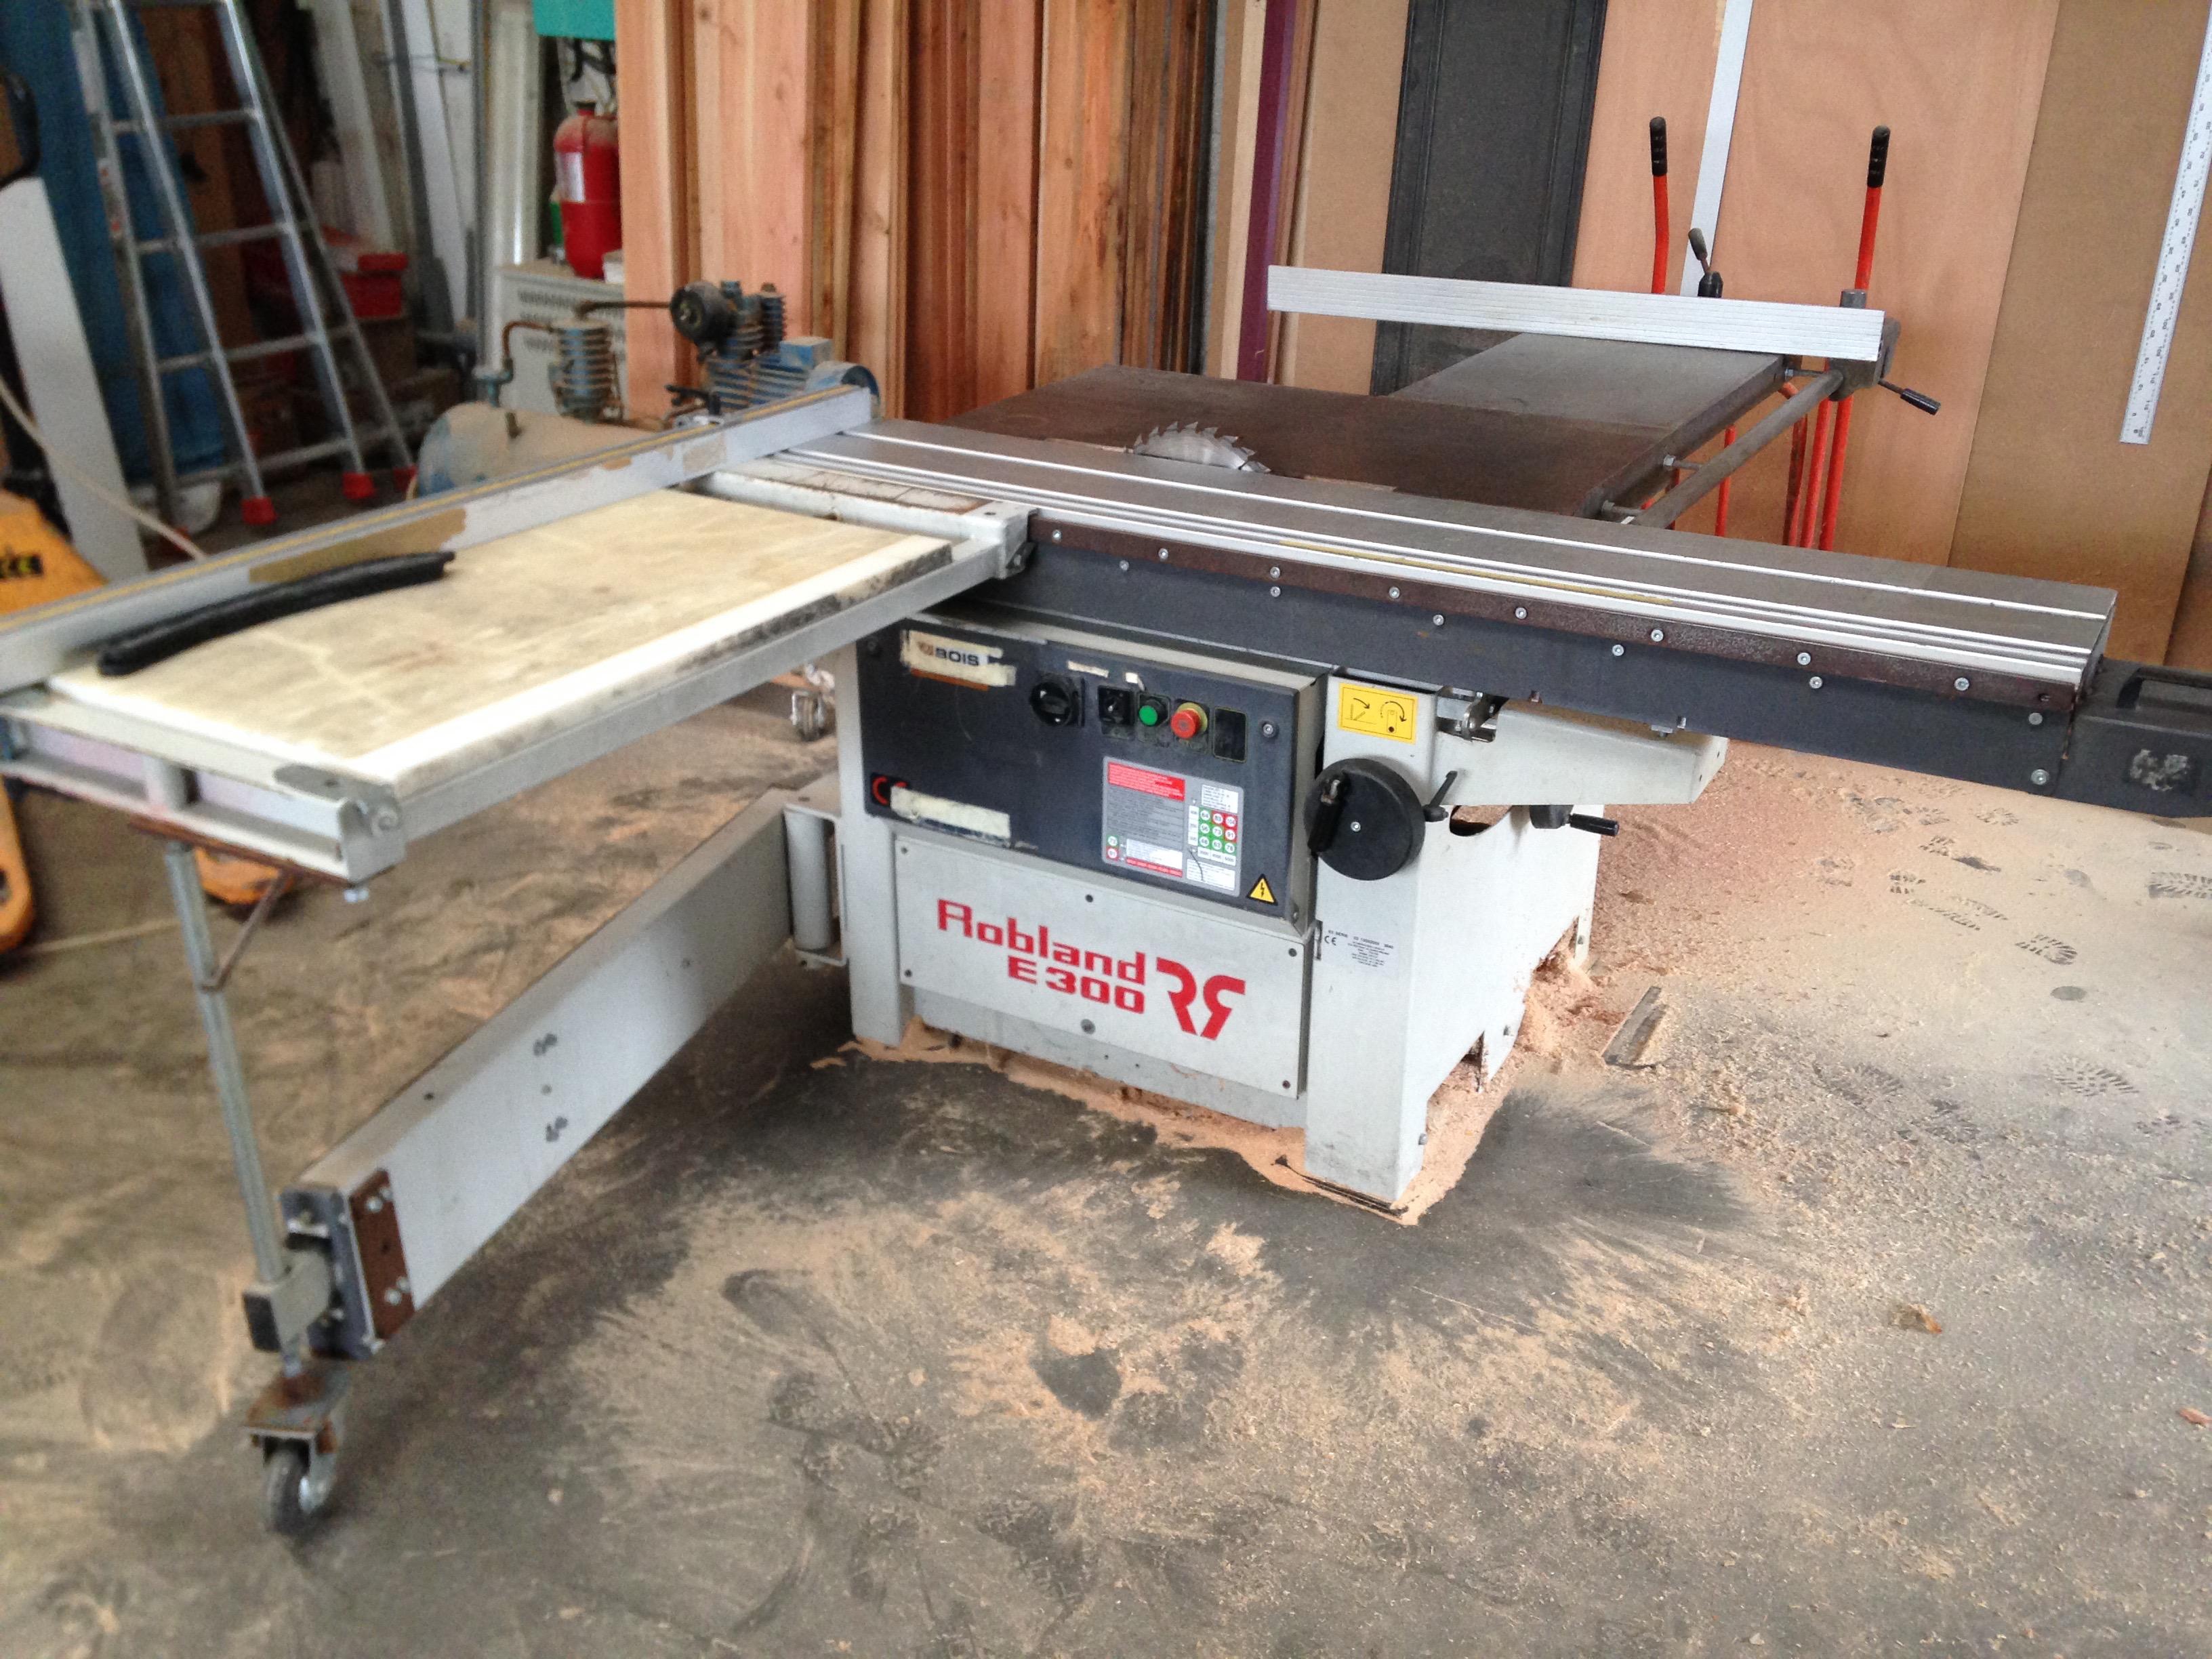 Robland E300 Sliding Table Saw Exapro